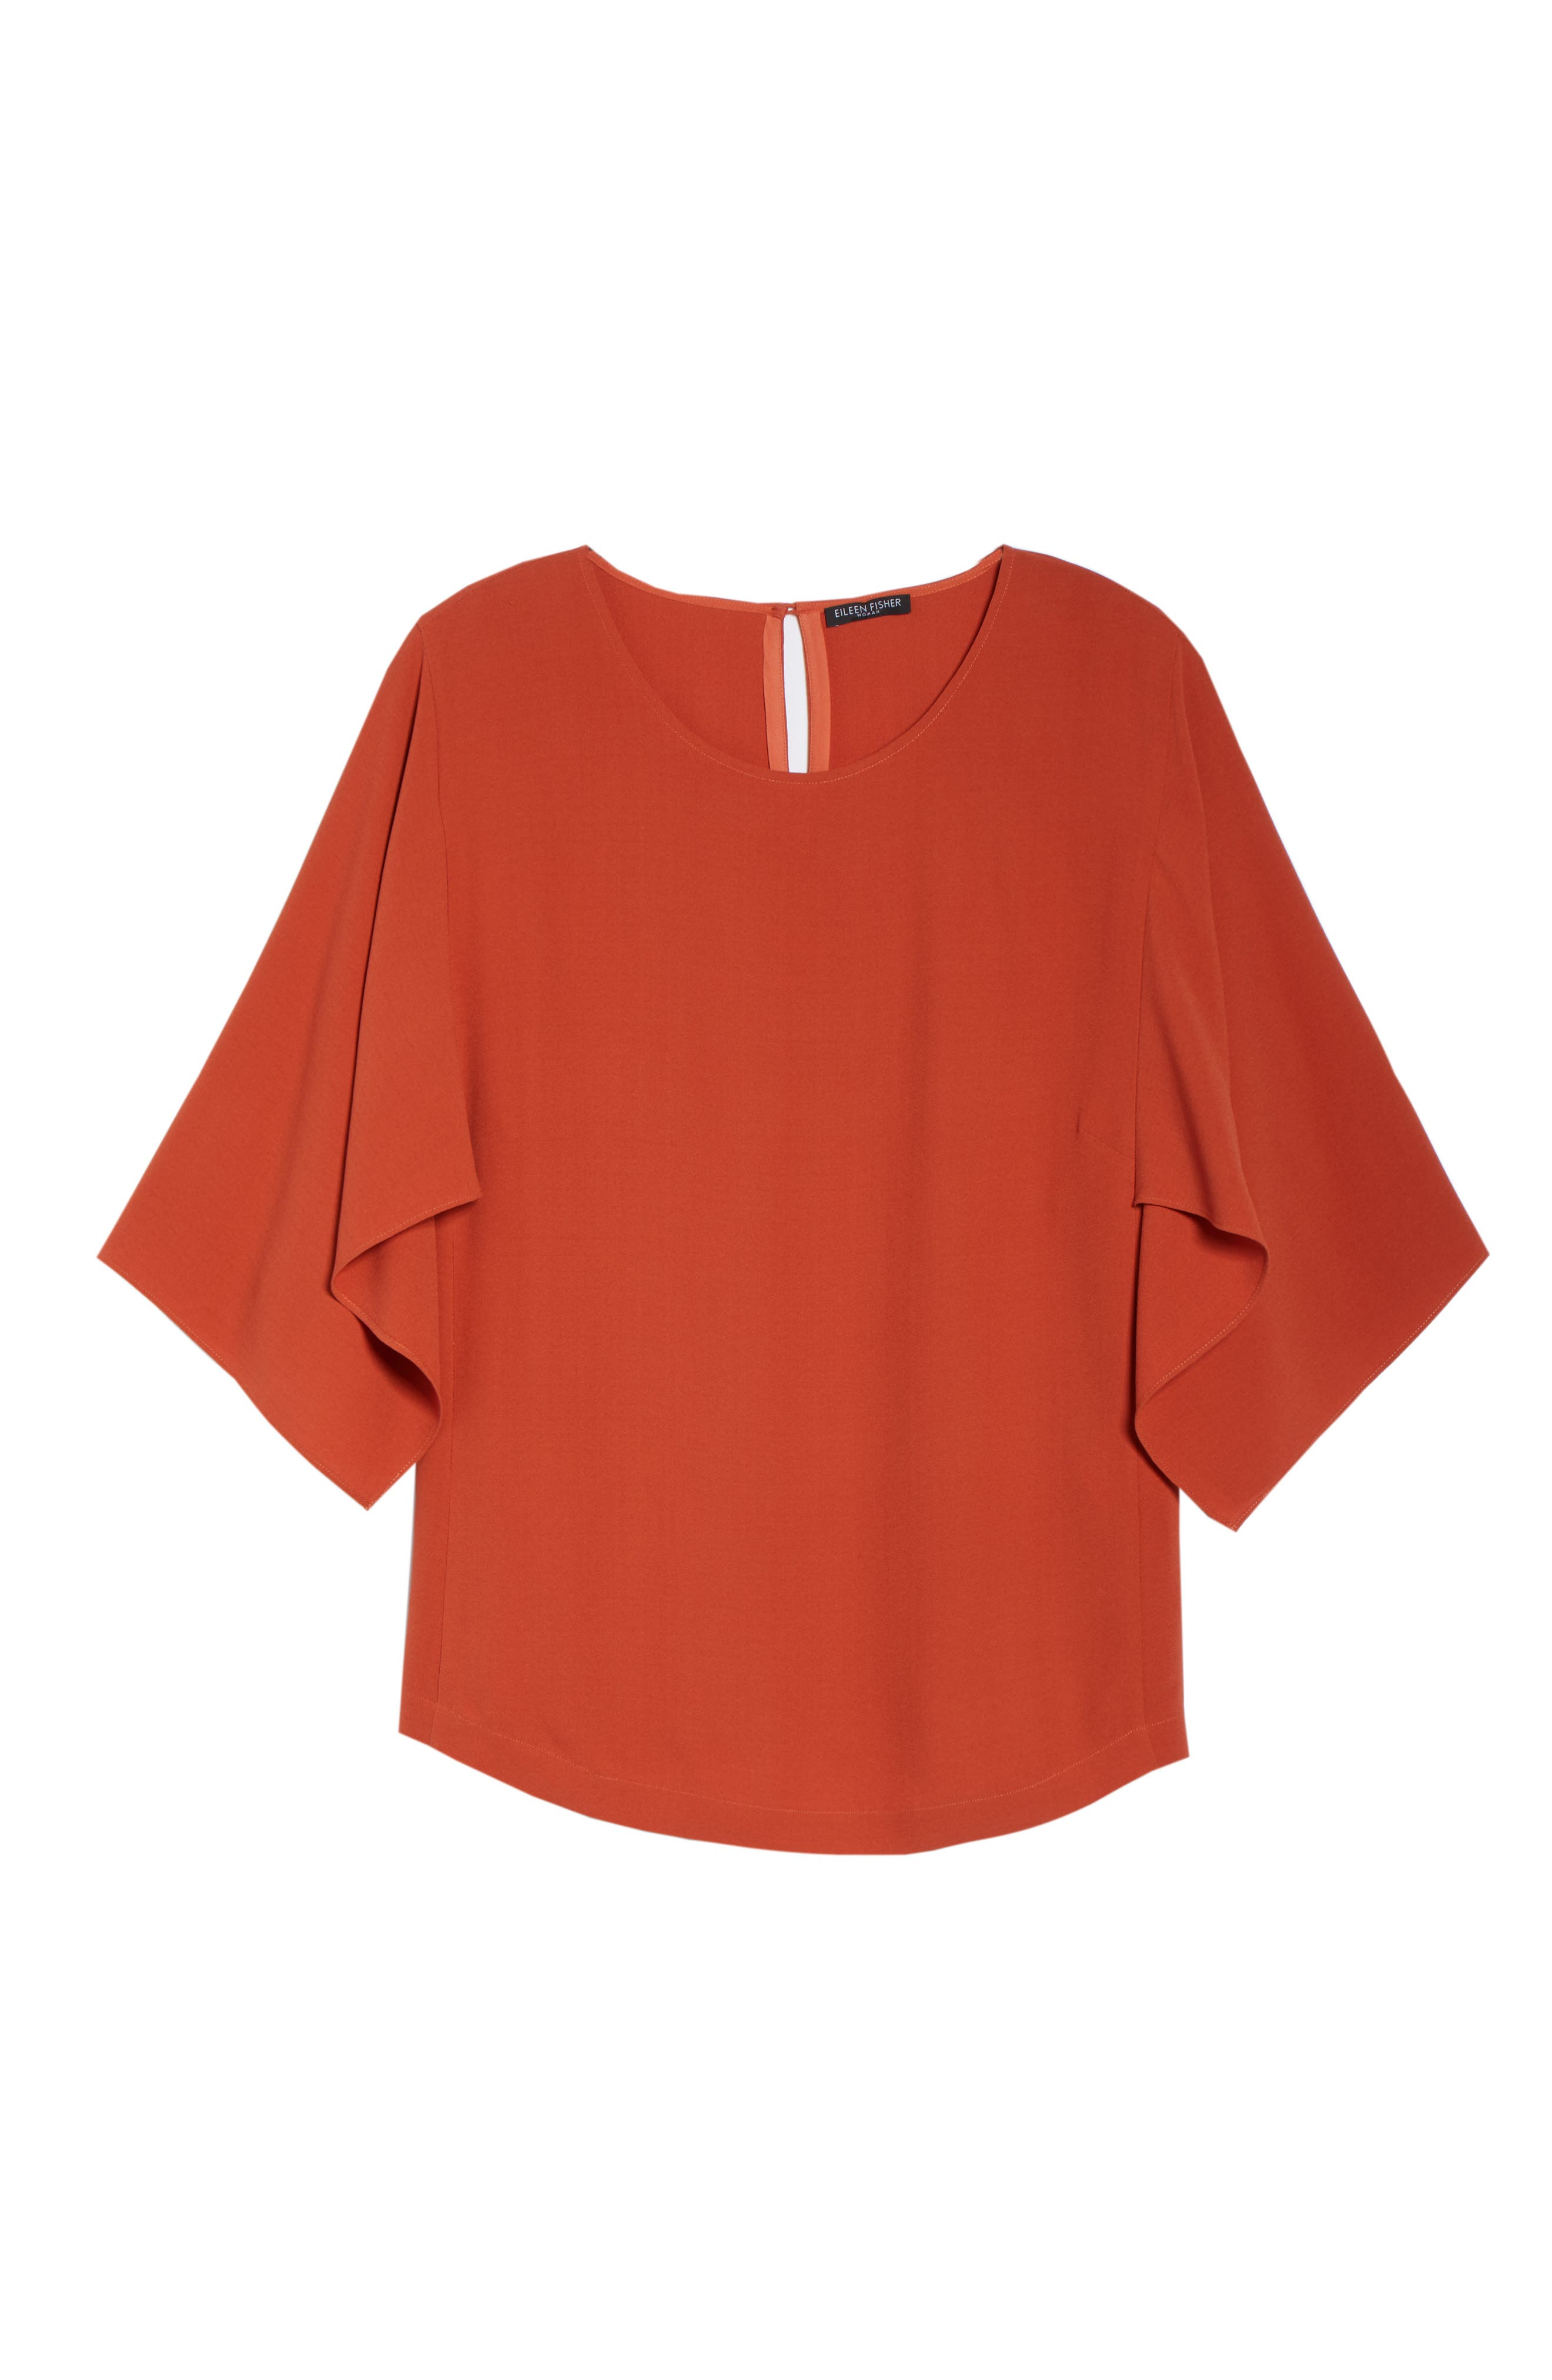 Slit Sleeve Silk Top,                             Alternate thumbnail 7, color,                             ORANGE PEKOE